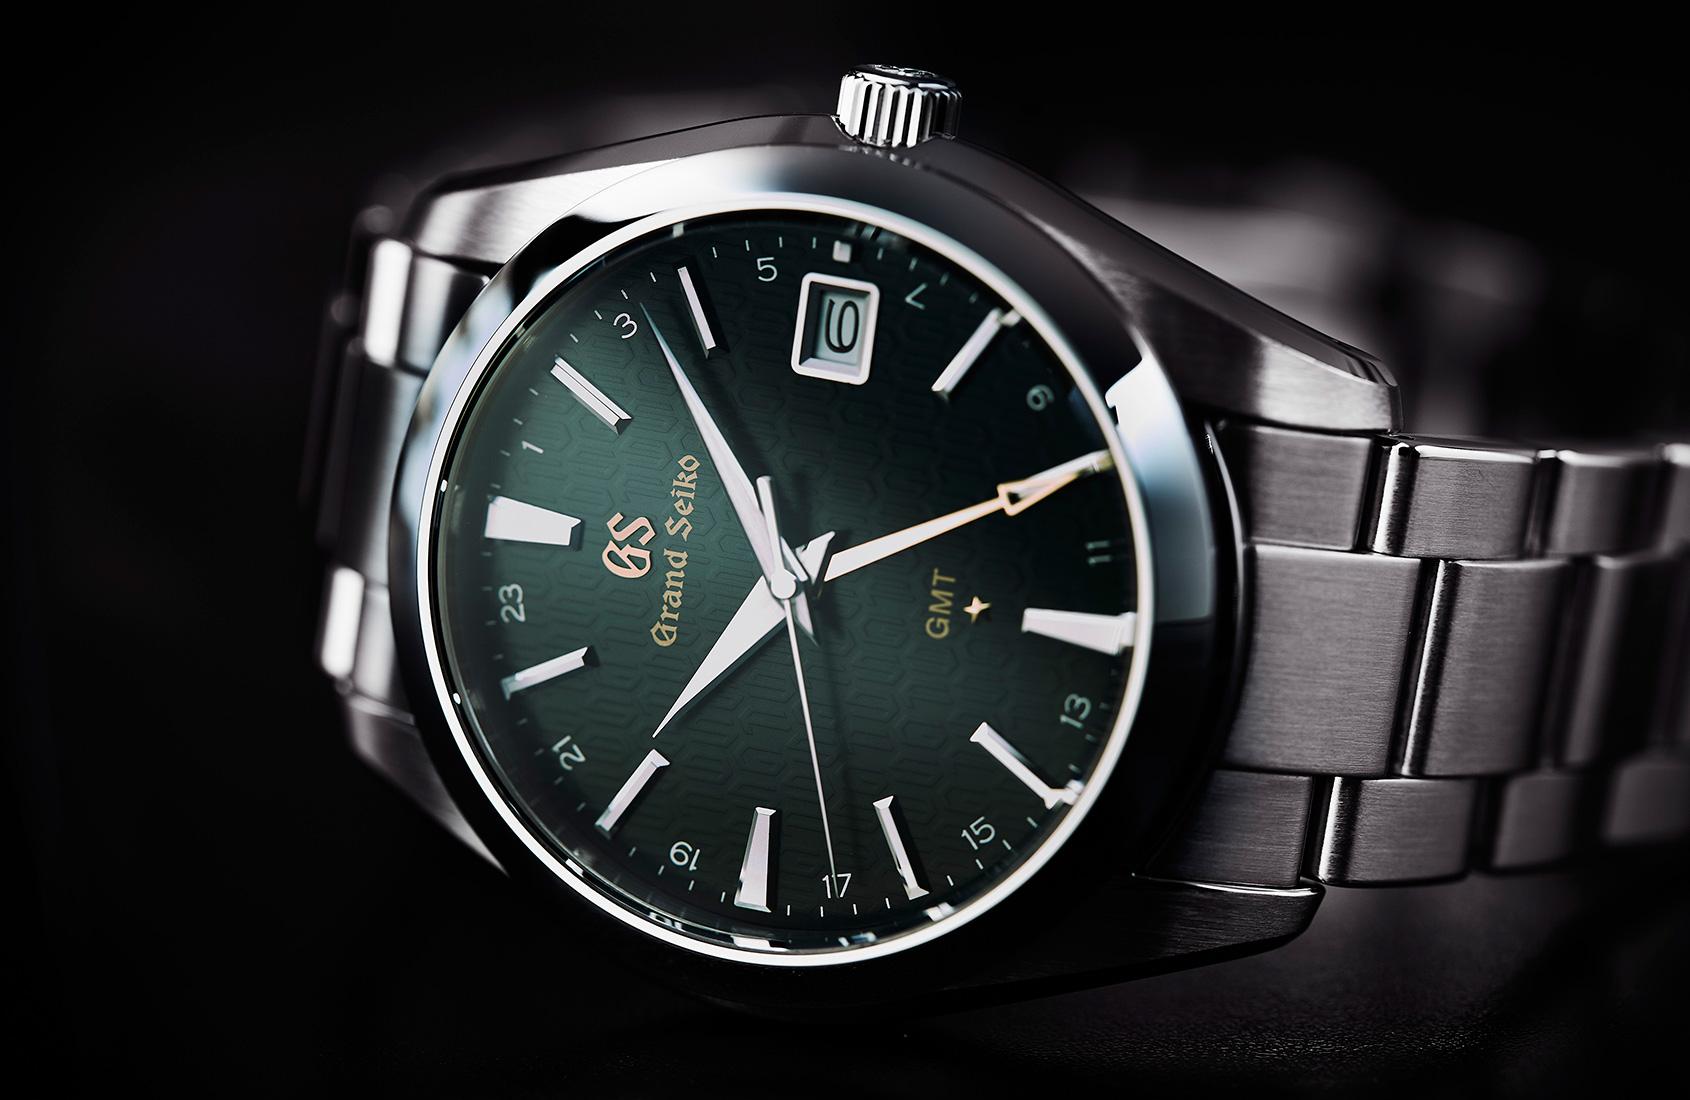 Bracelet watch straps